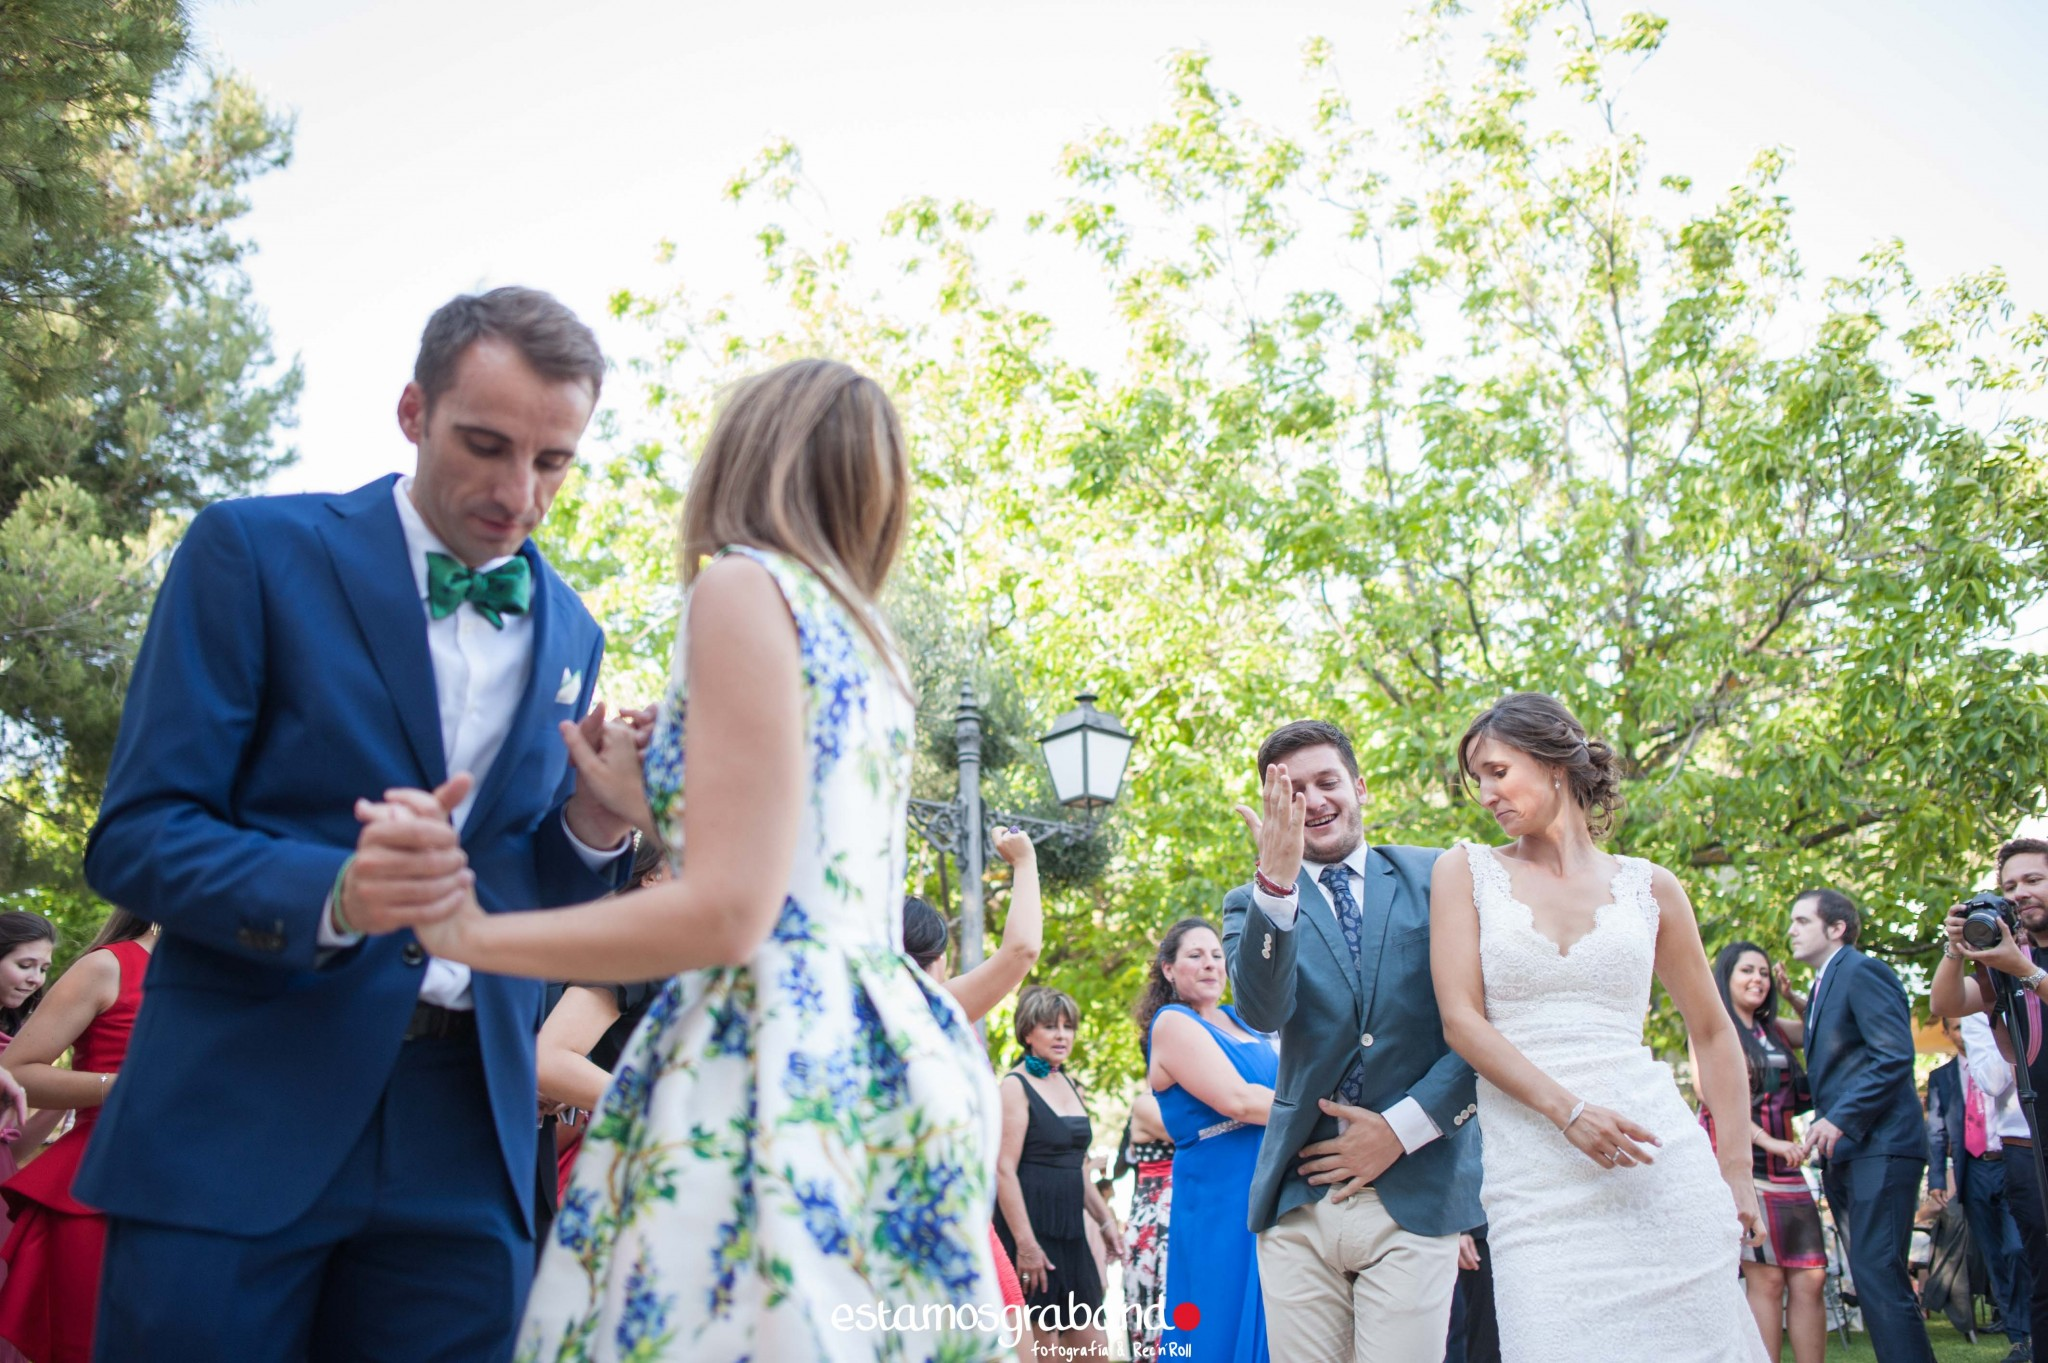 LEO-Y-PEDRO-73 Fotografía de Boda_Leo & Pedro [Jardines de la Mamunia, Granada] - video boda cadiz